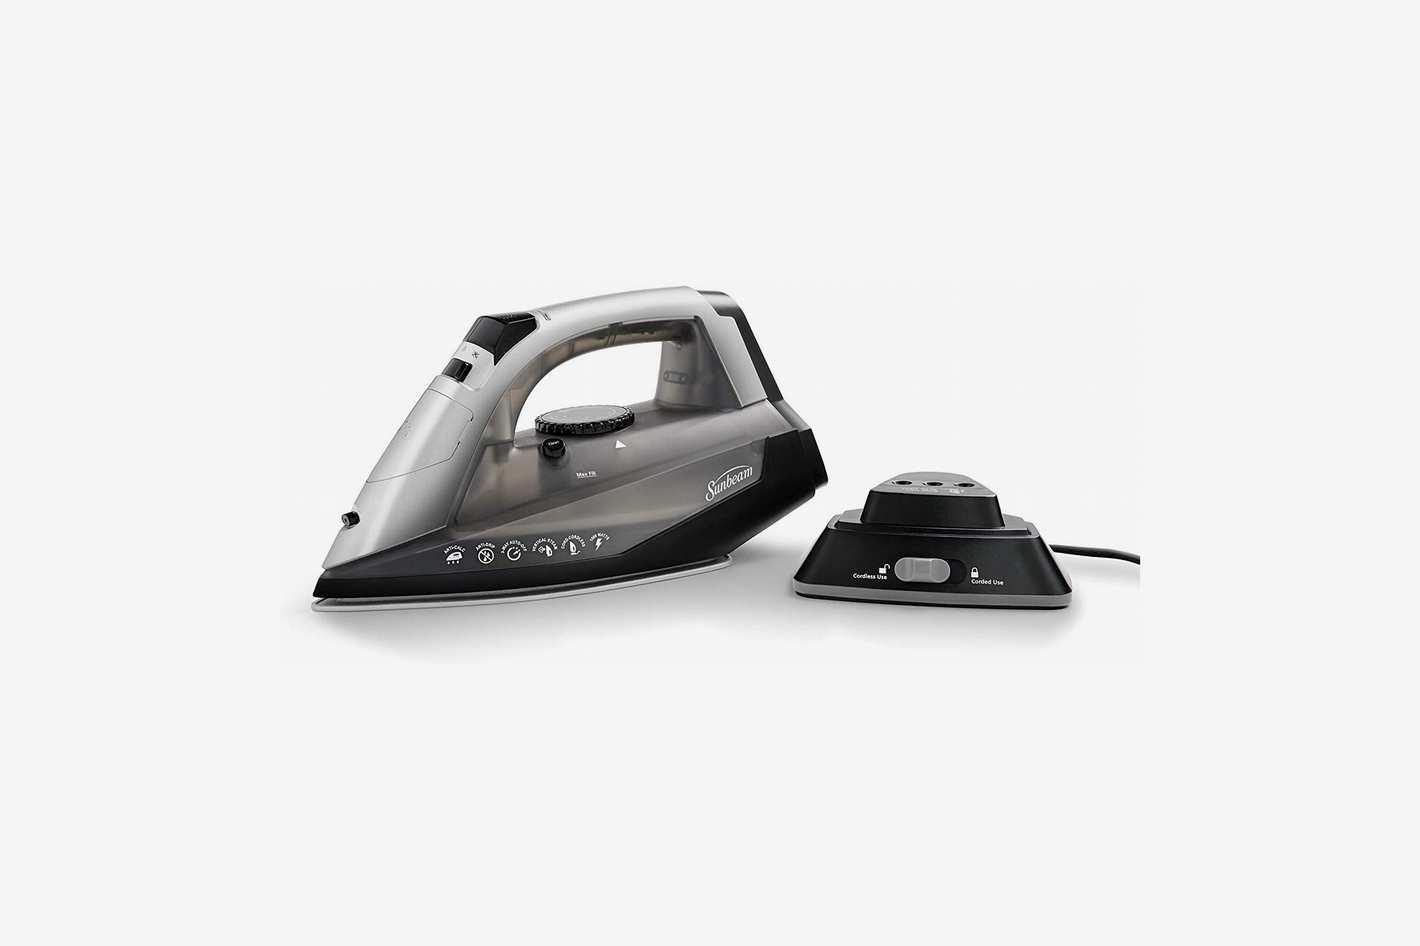 Sunbeam Cordless or Corded Iron GCSBNC-200